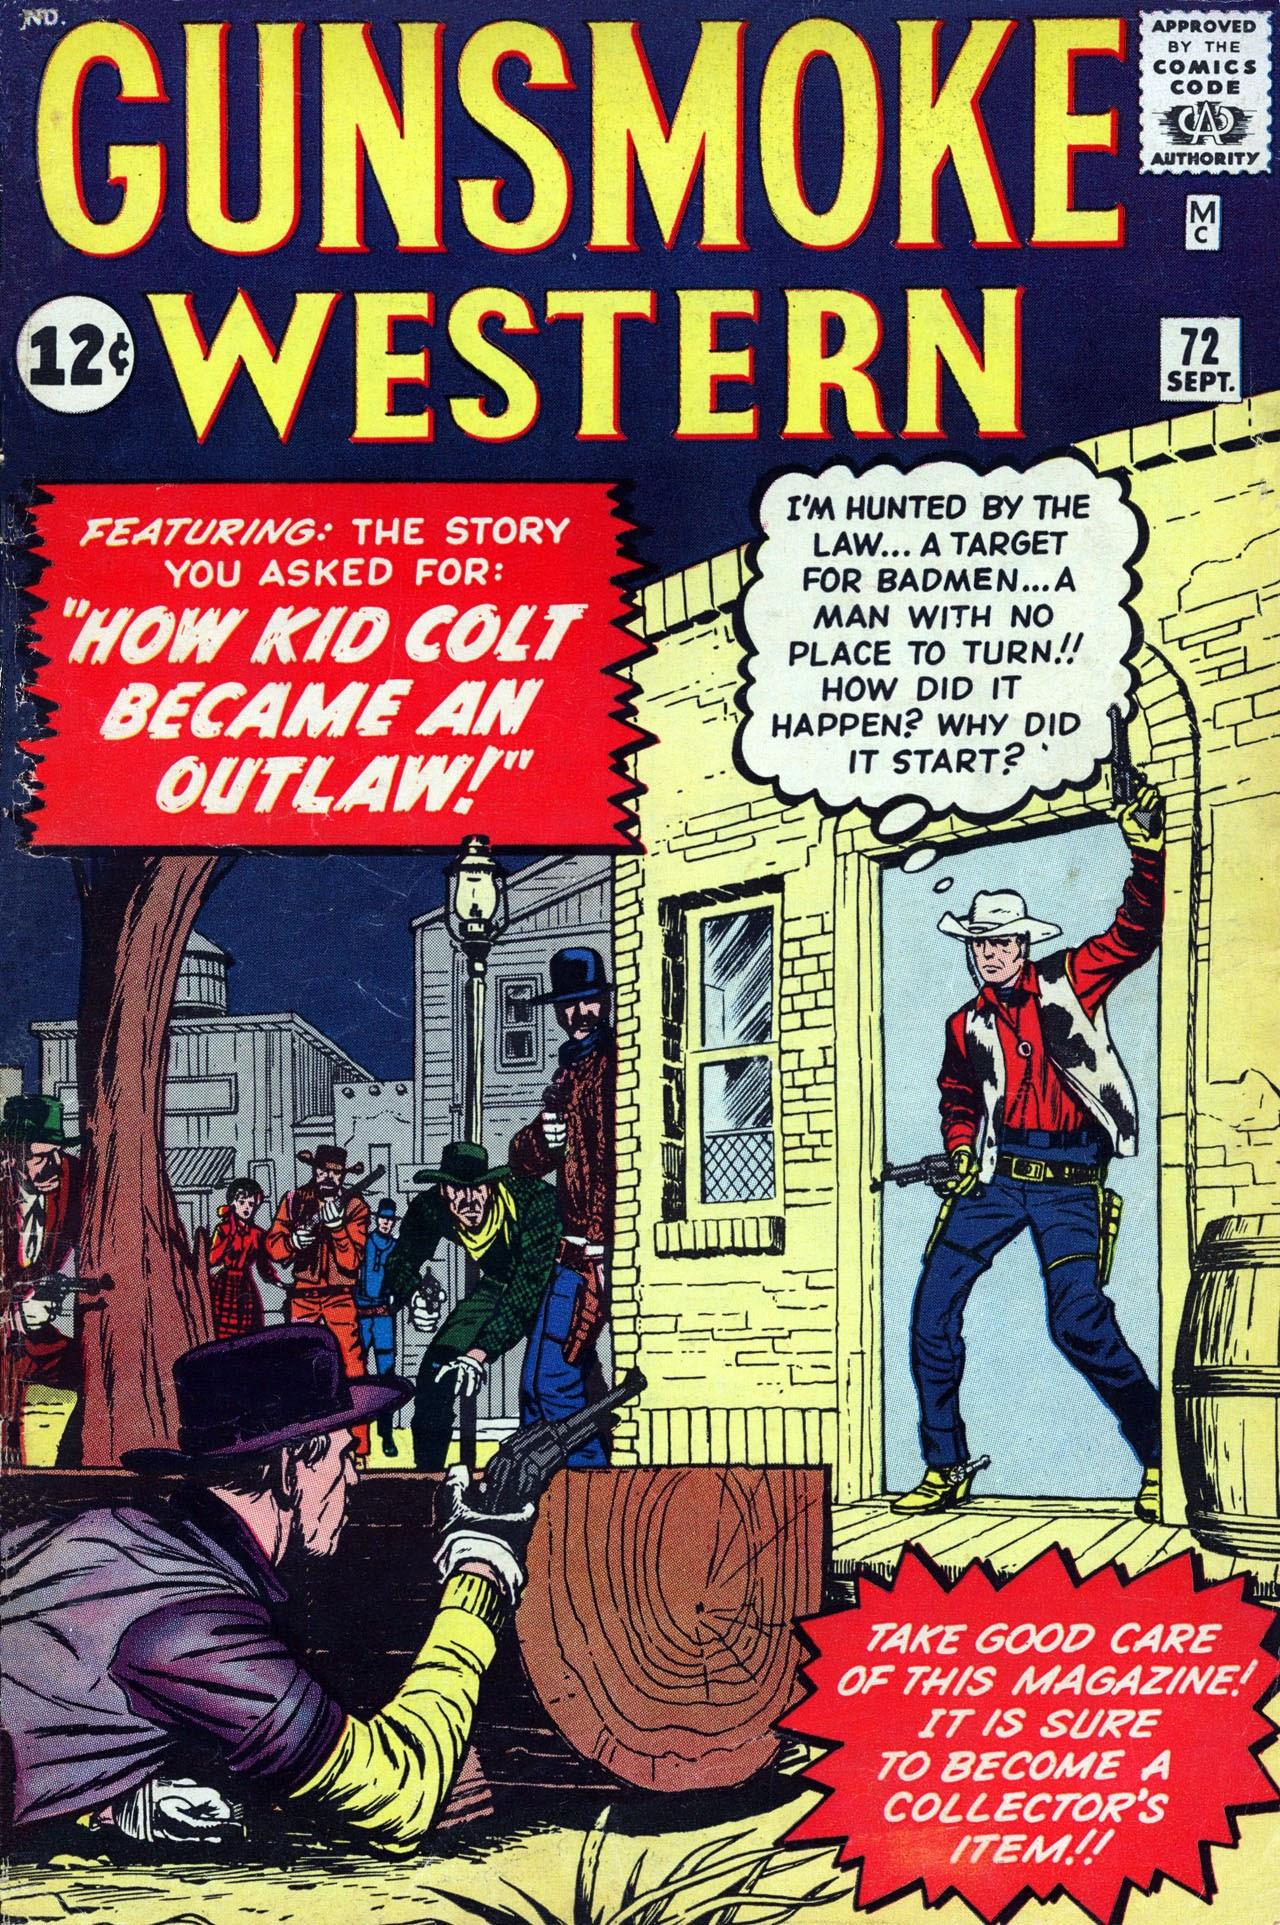 Gunsmoke Western 72 Page 1